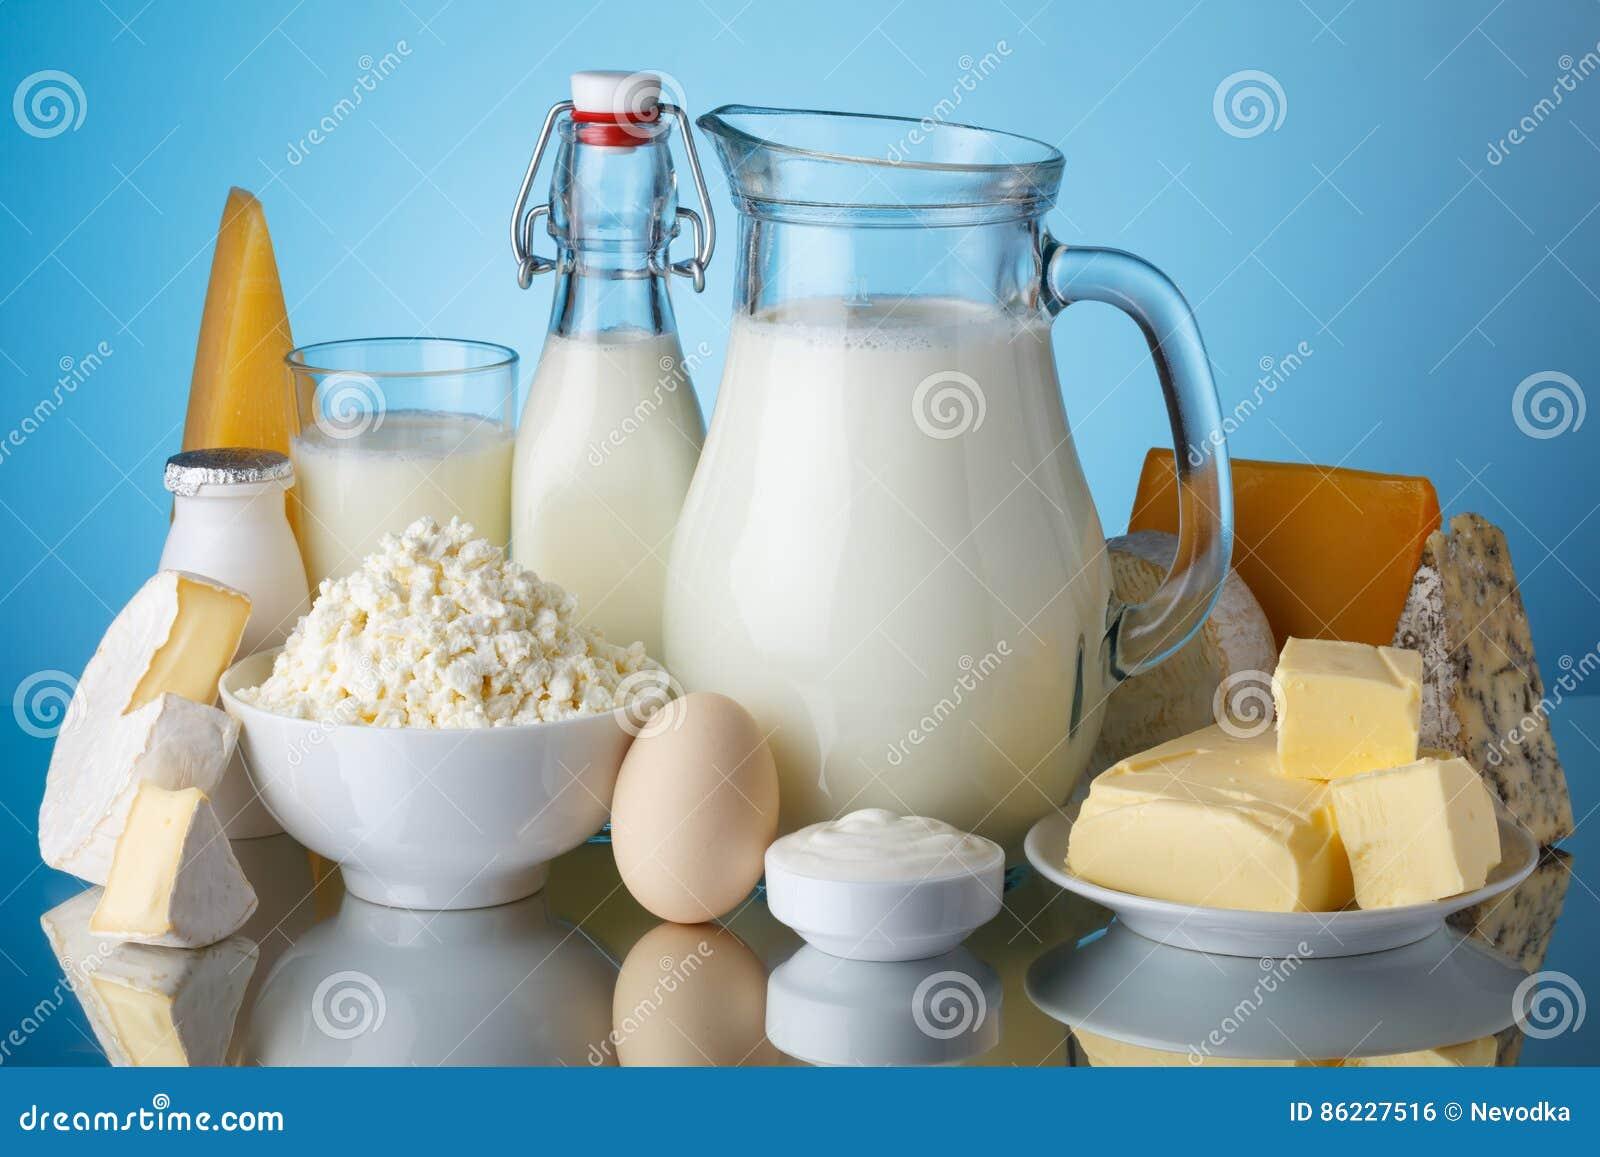 Nabiały, mleko, ser, jajko, jogurt